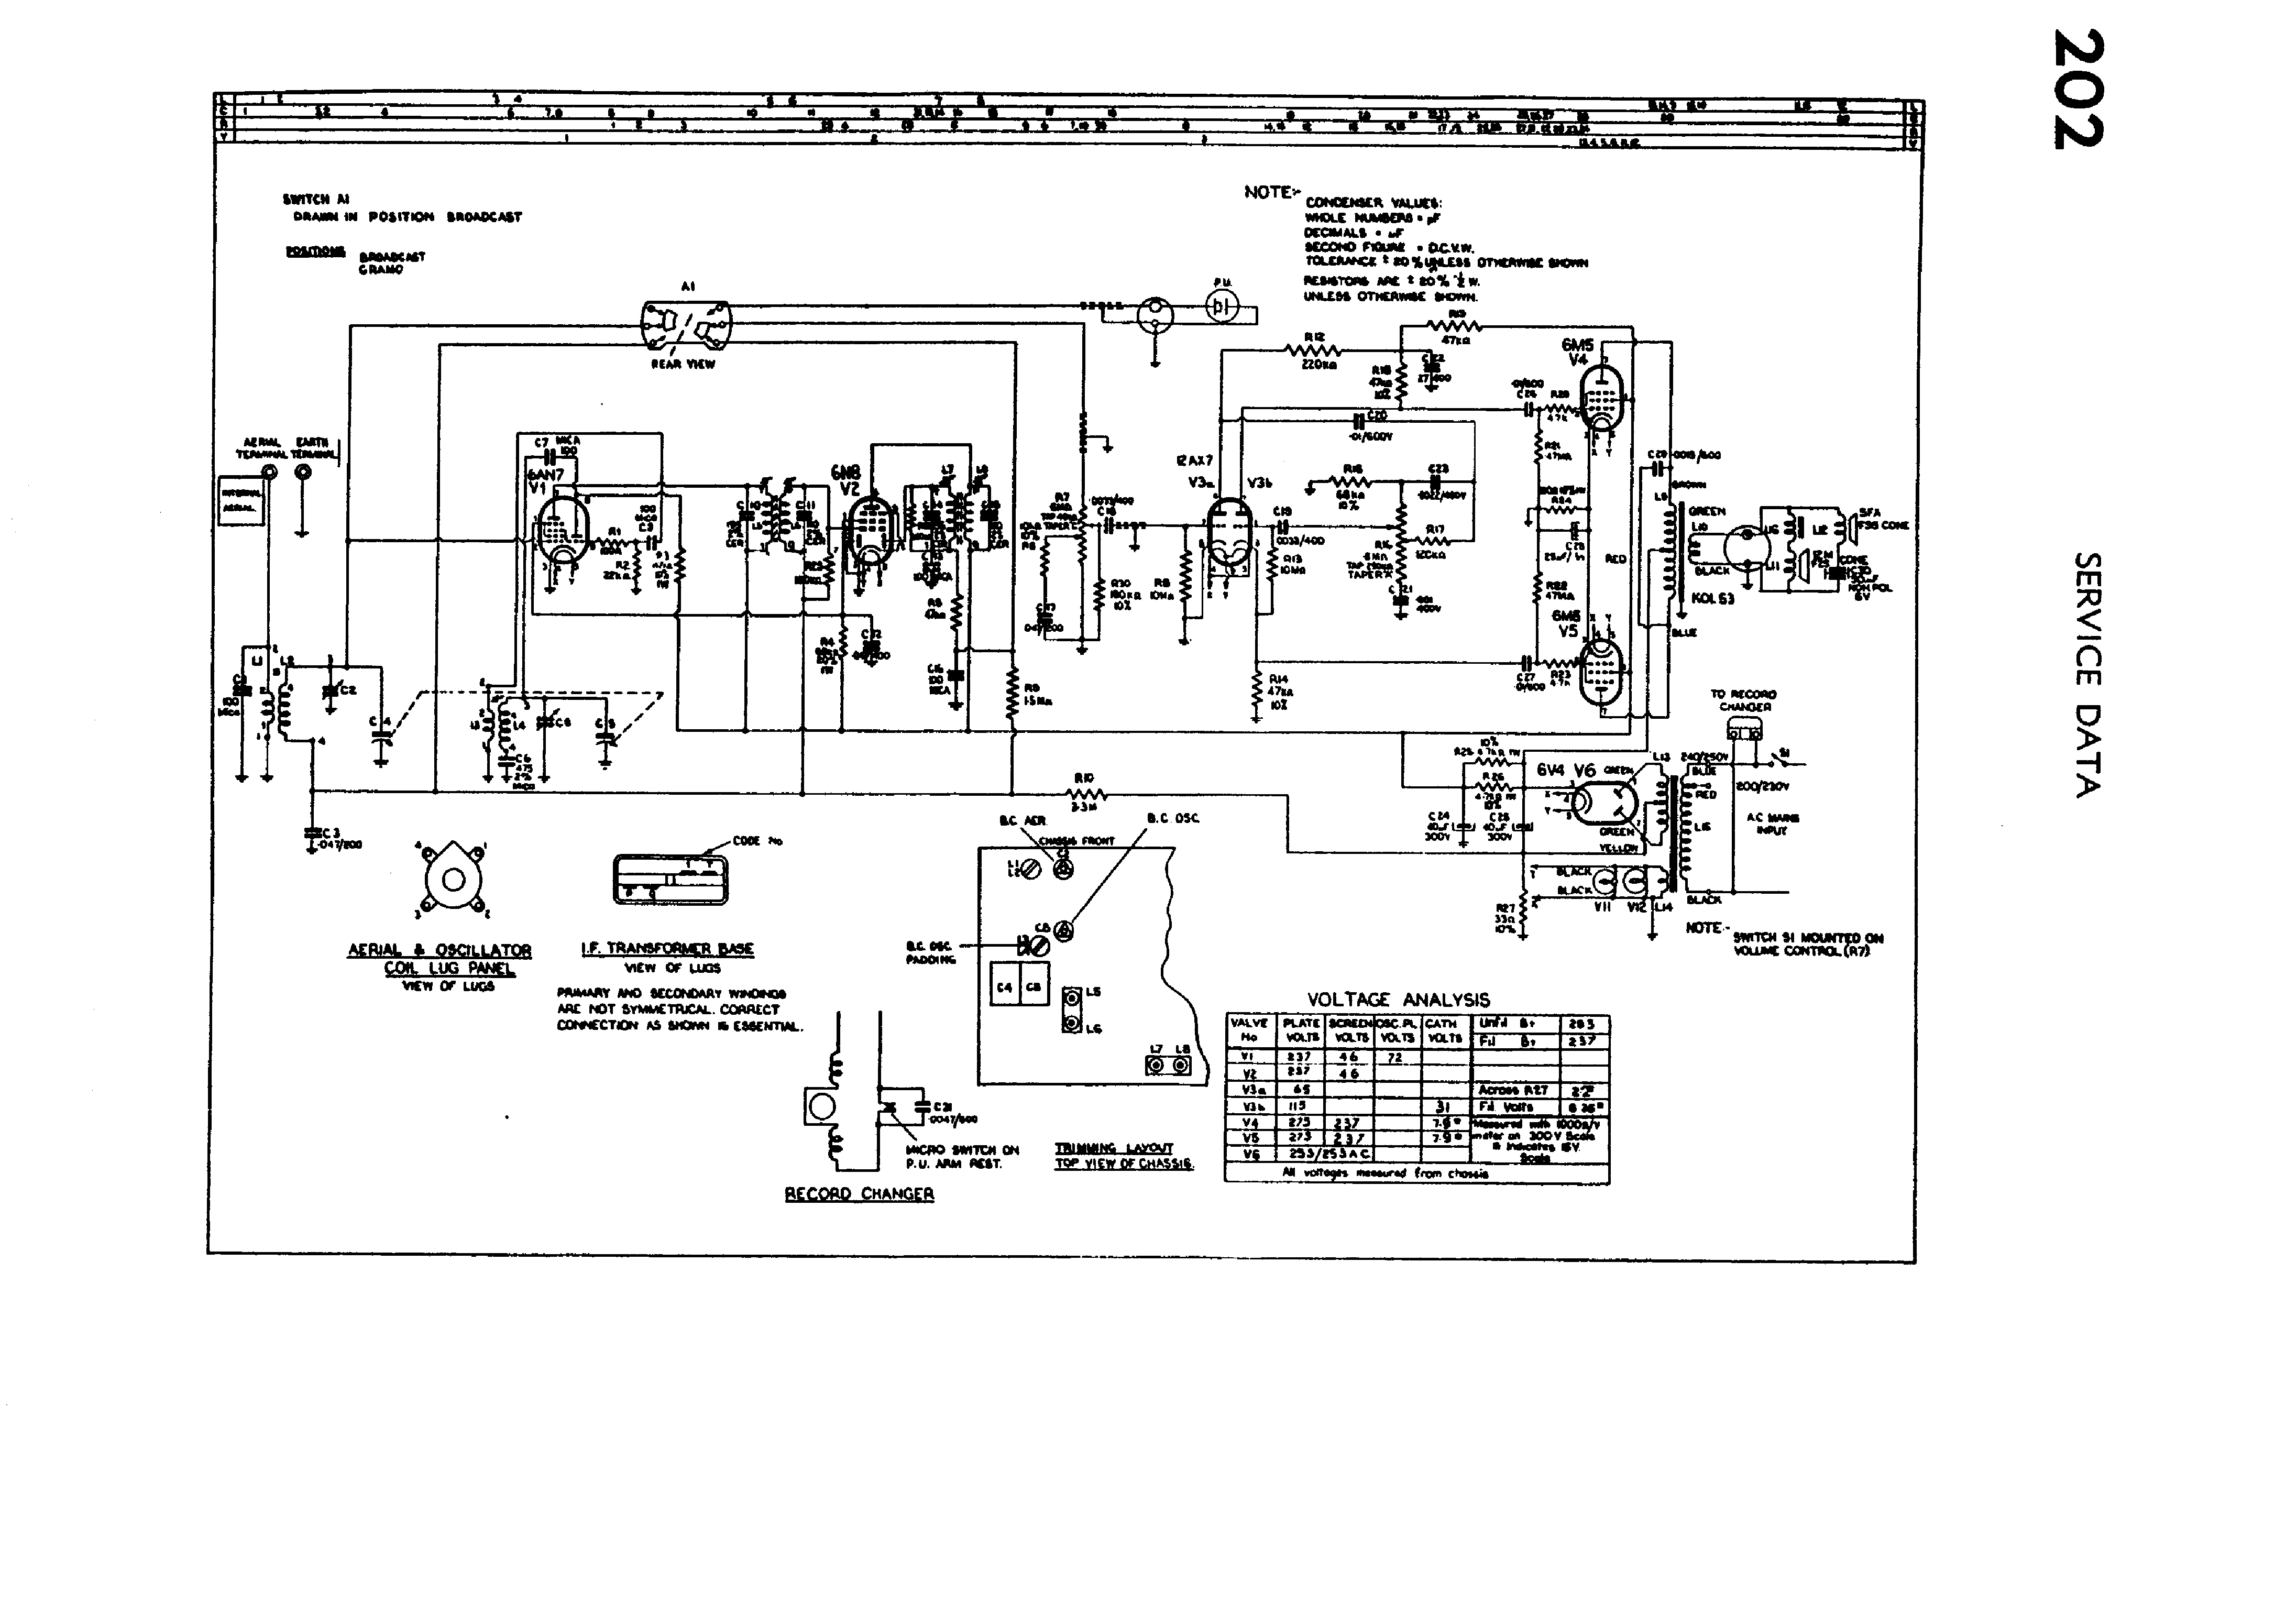 Philips 202 Service Manual Download  Schematics  Eeprom